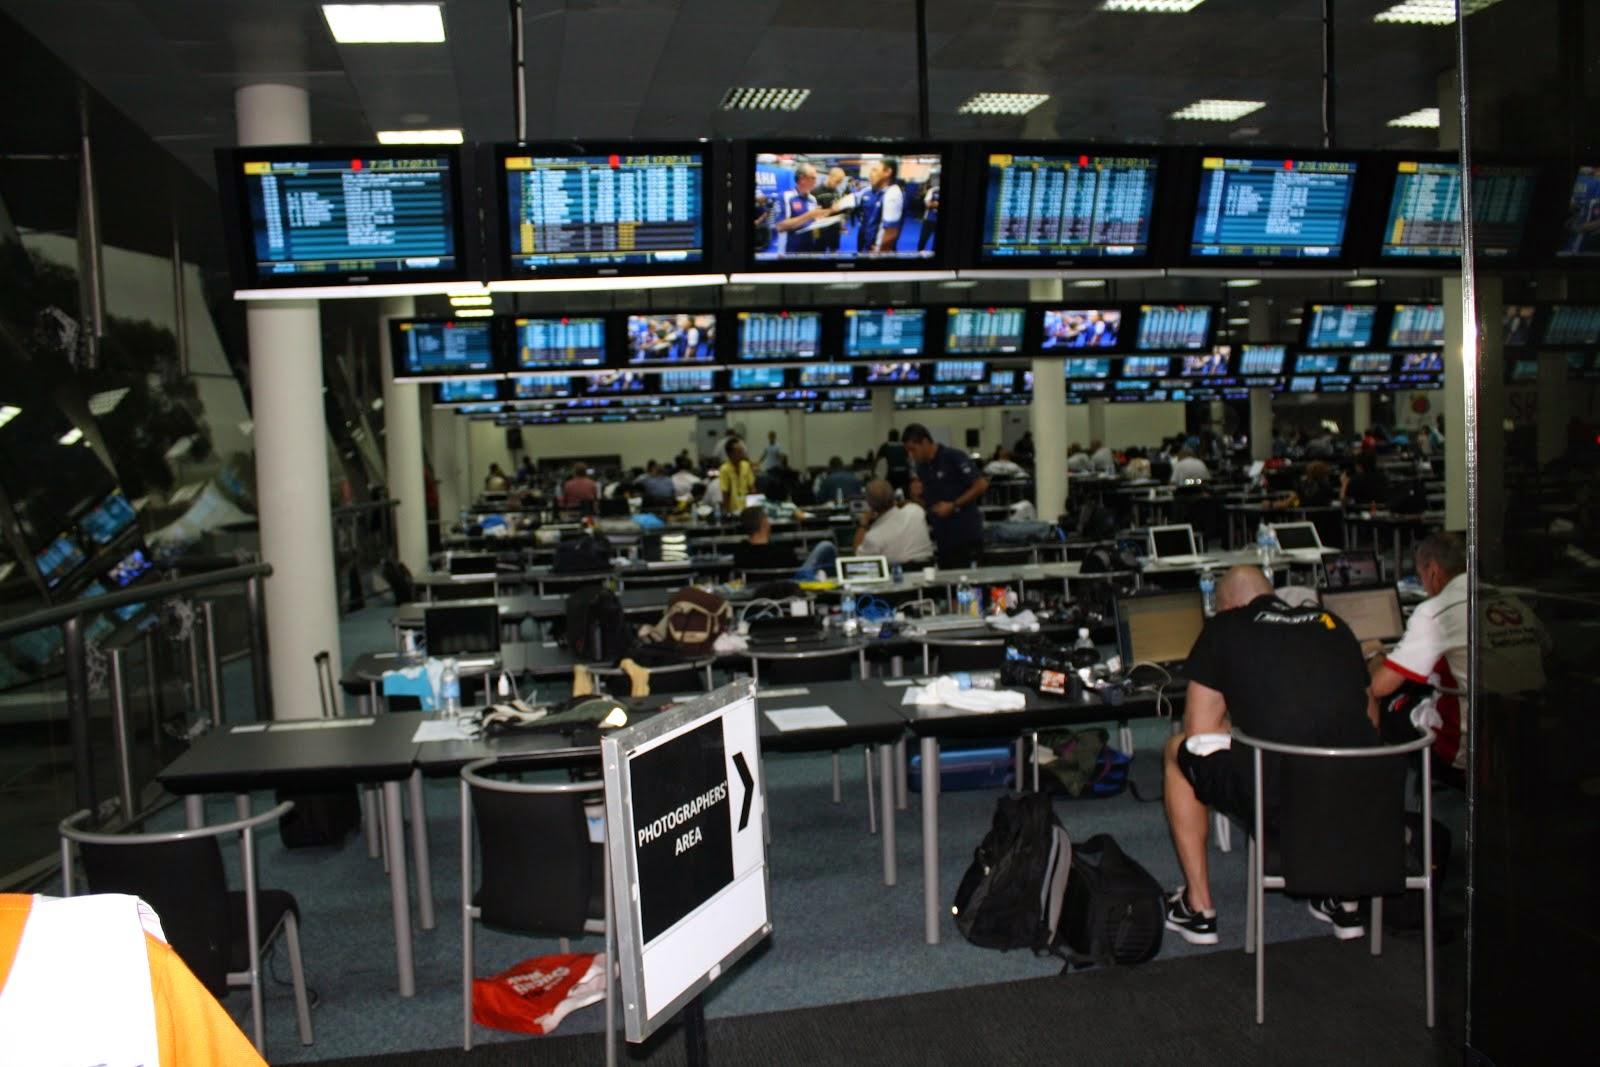 sala de prensa del circuito de sepang